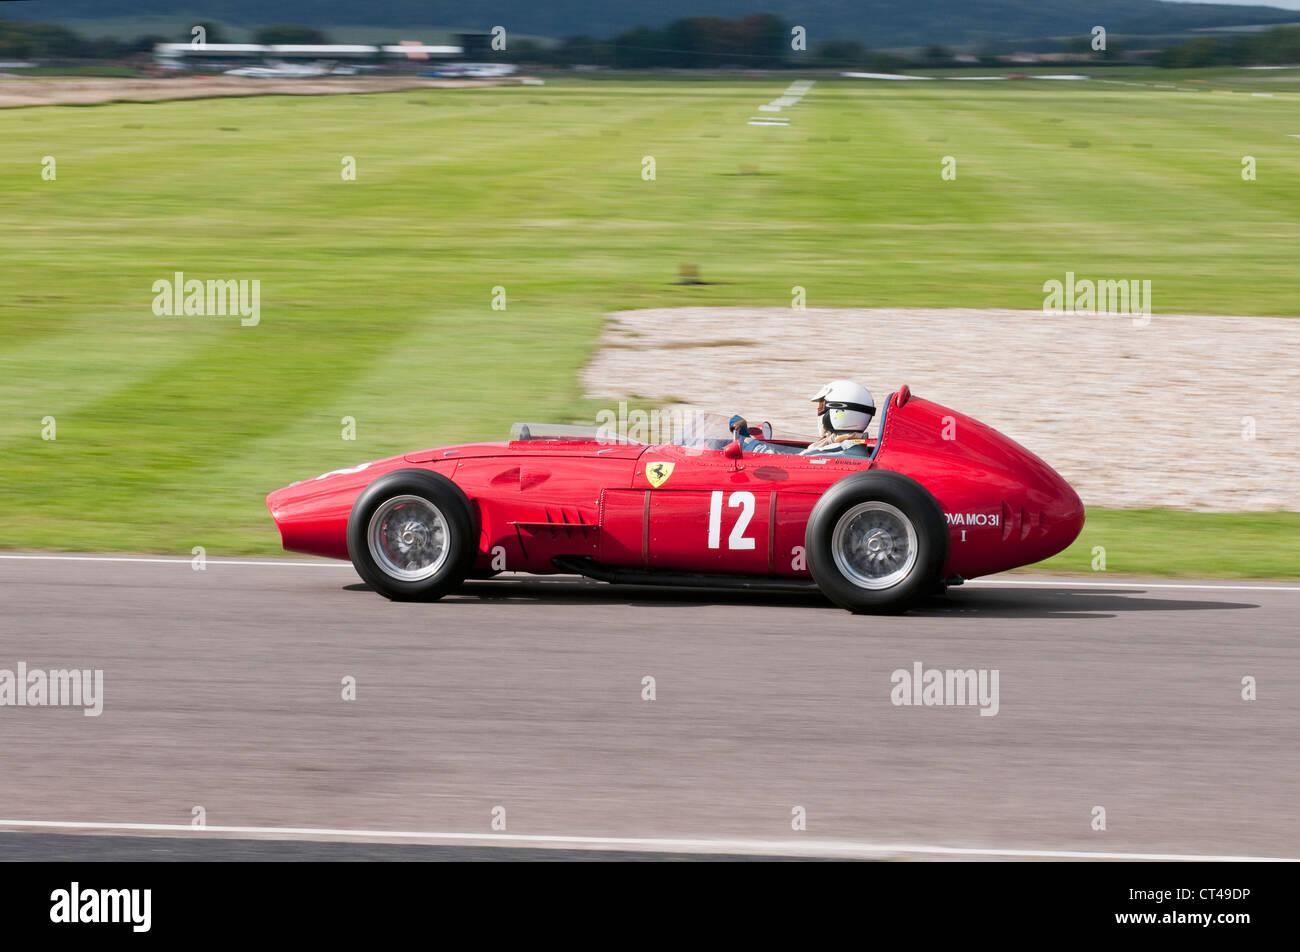 Classic 1950 S Ferrari 246 Dino F1 Car At The Goodwood Revival Stock